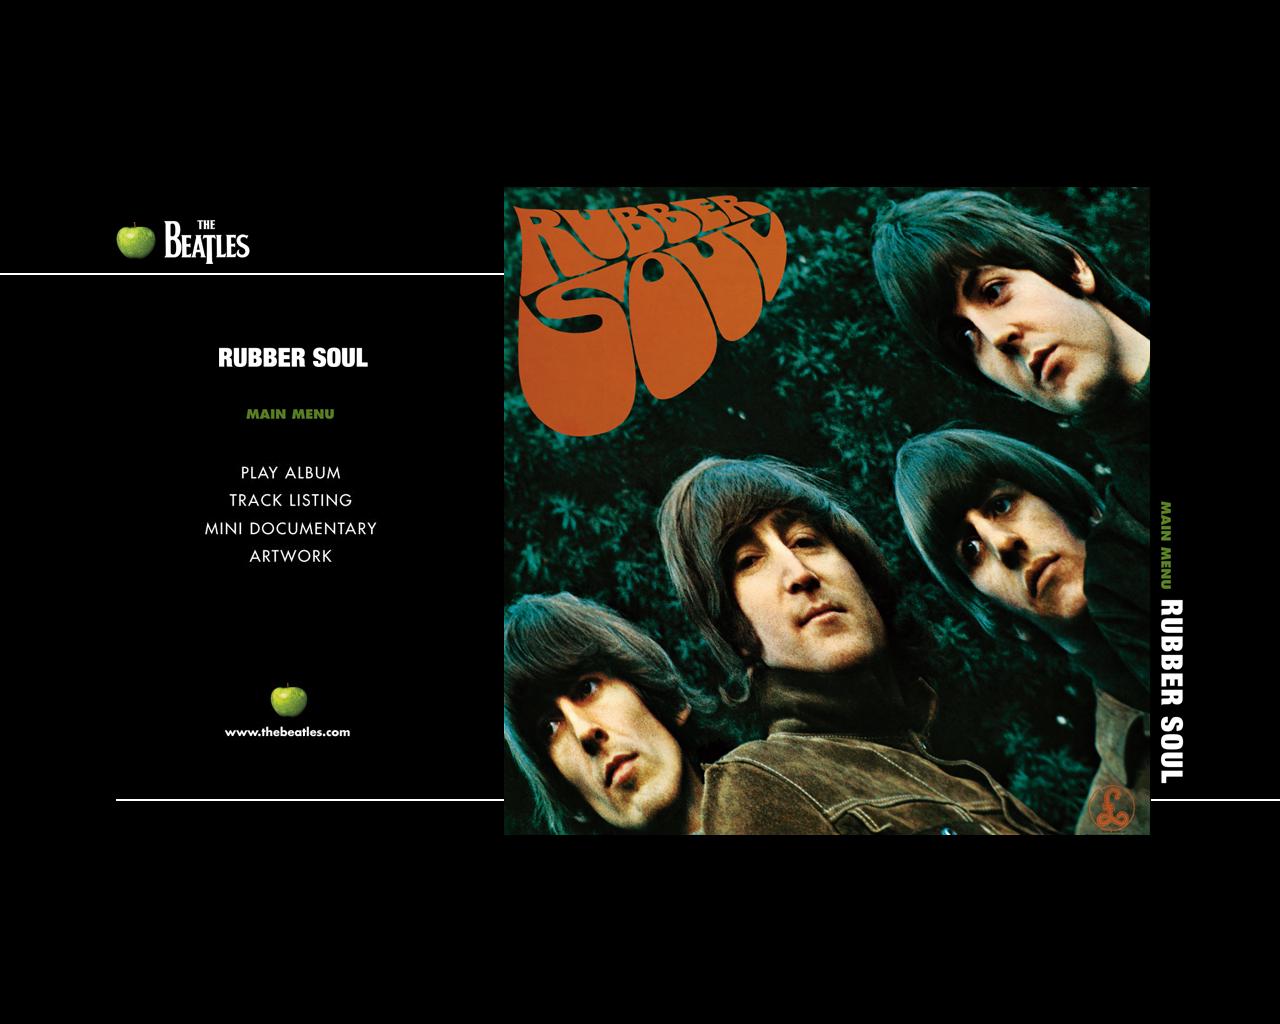 The Beatles - Rubber Soul [iTunes Plus AAC M4A] - PSXDB